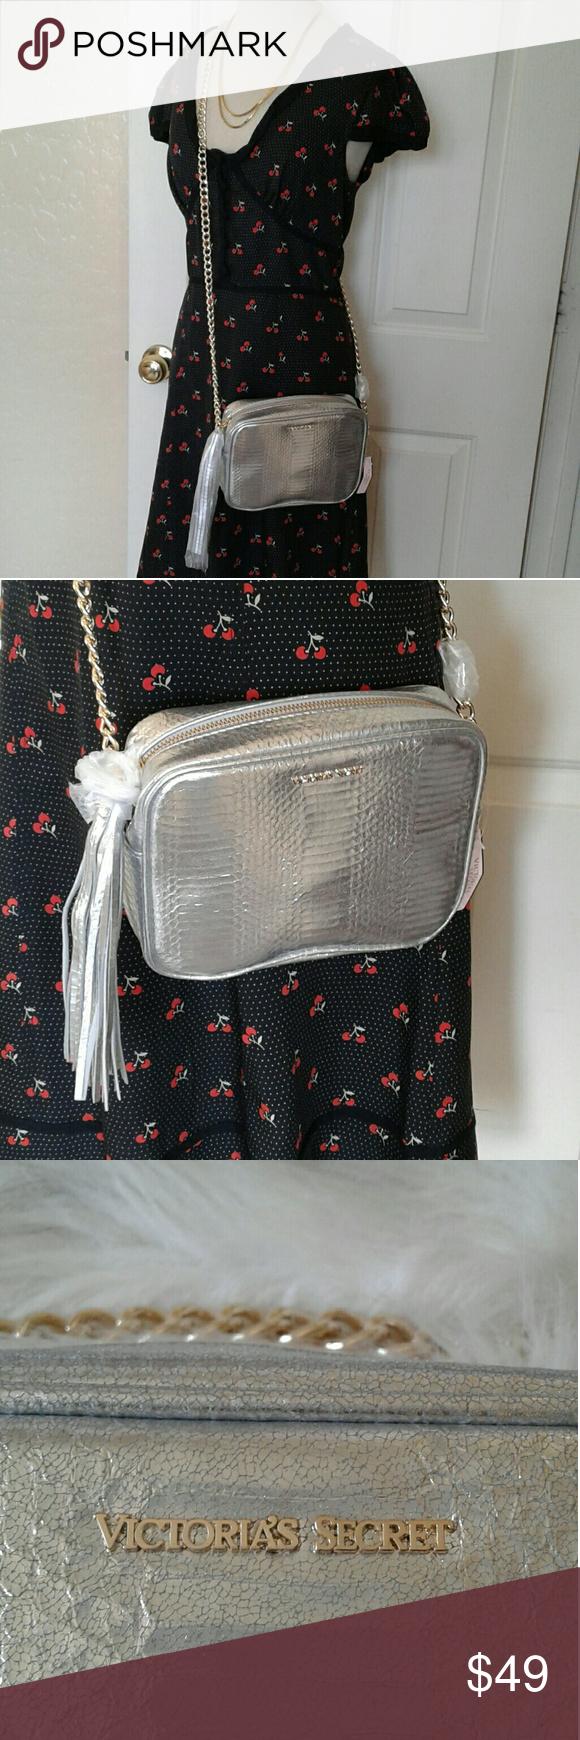 Victoria's secret purse Alike snake skin silver Victoria's secret purse  8.5 wide 6.5 length 23 strap drop. Victoria's Secret Bags Crossbody Bags